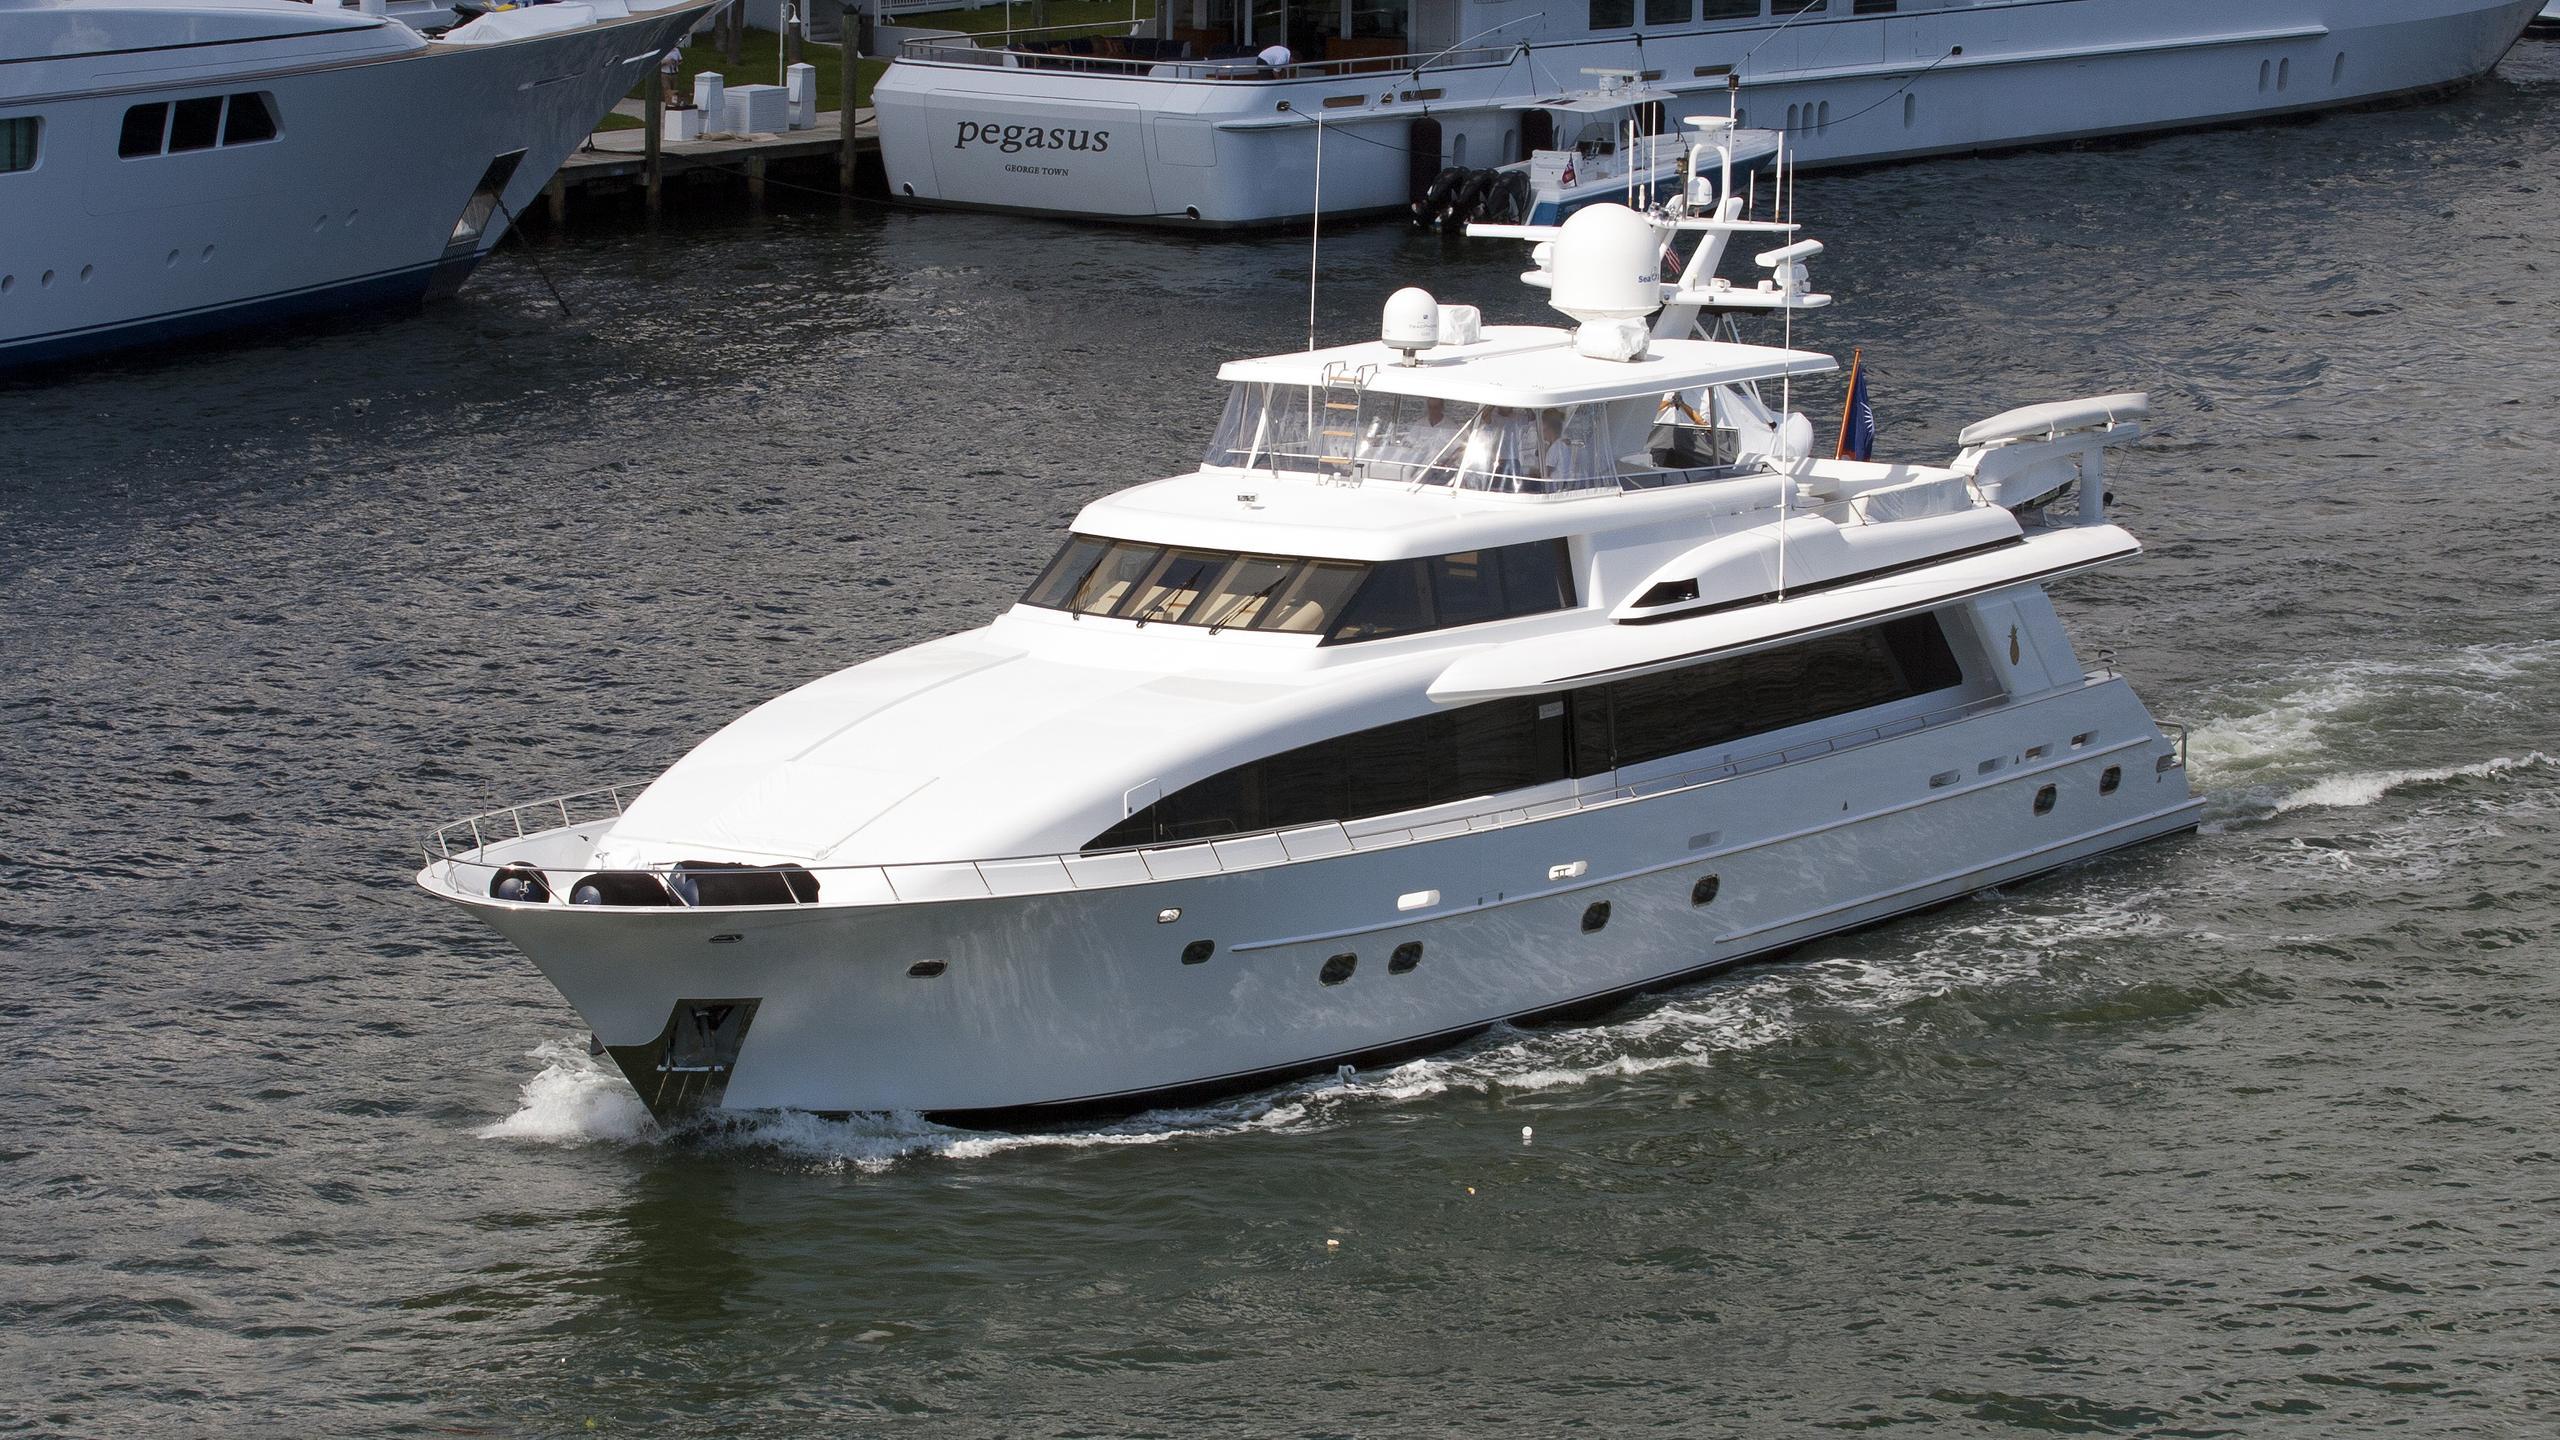 sans-souci-motor-yacht-crescent-1996-35m-cruising